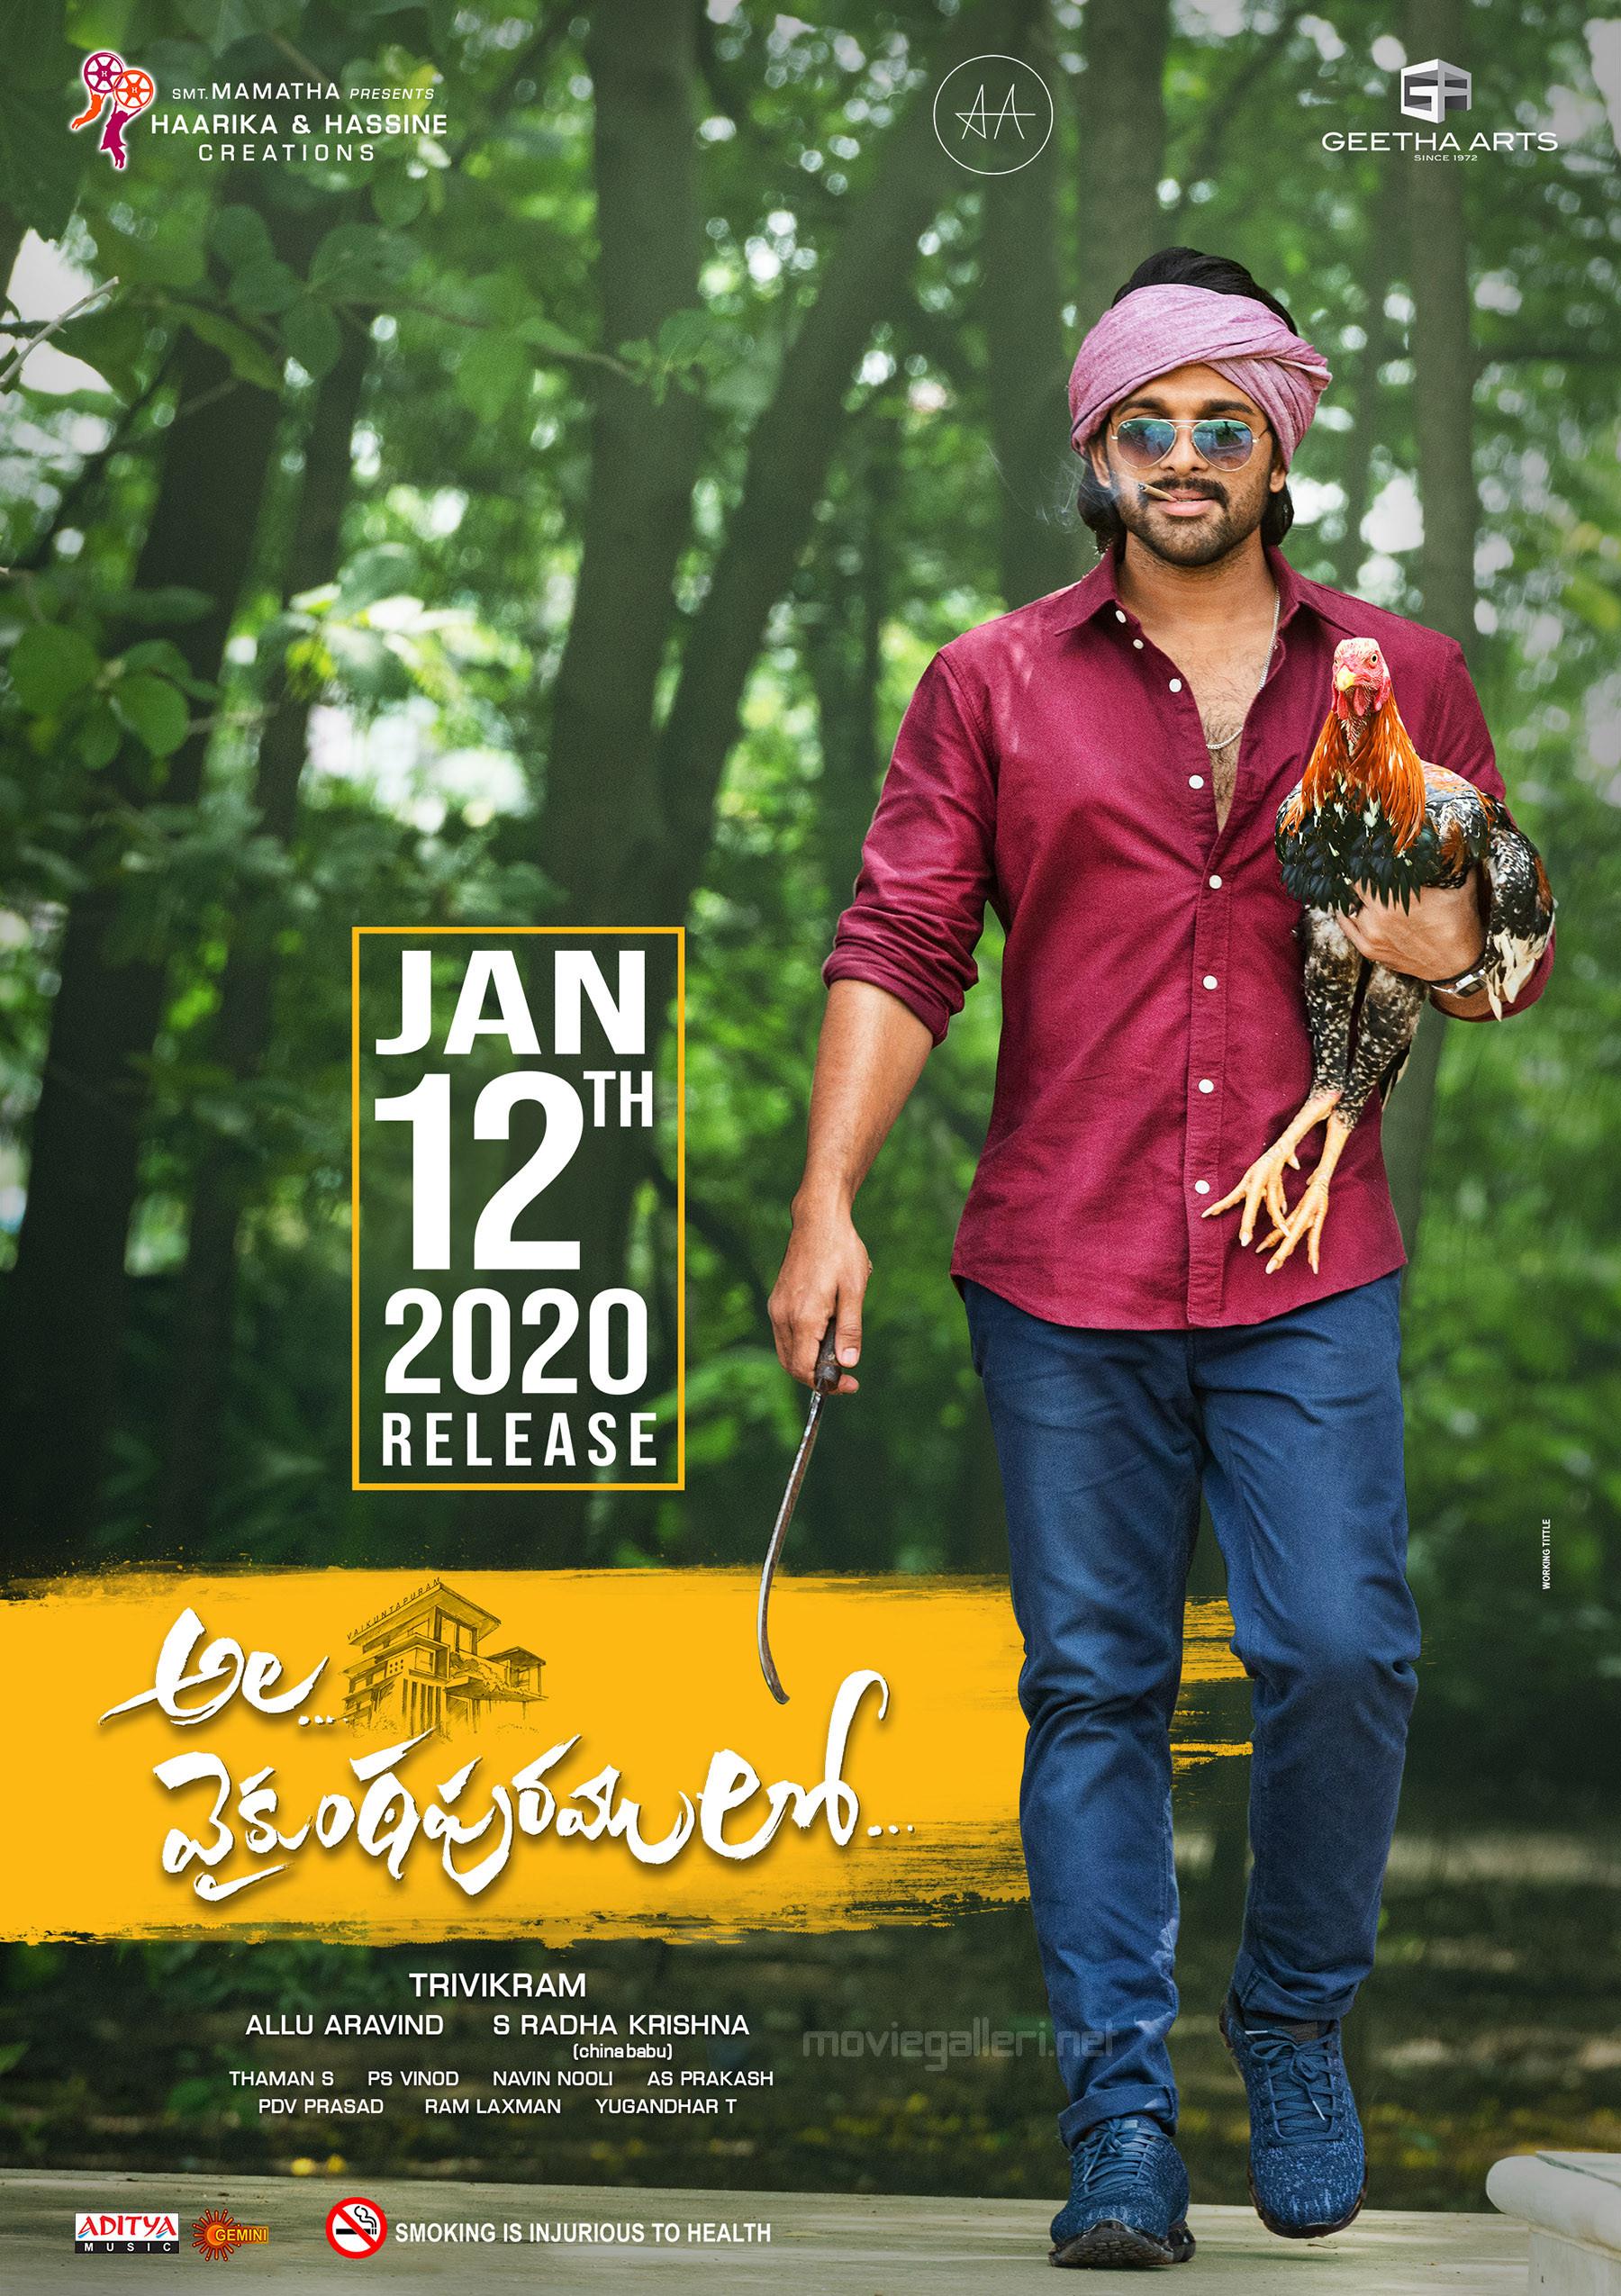 Allu Arjun Ala Vaikuntha Puram Lo Movie Release Date on 12 Jan 2020 Poster HD